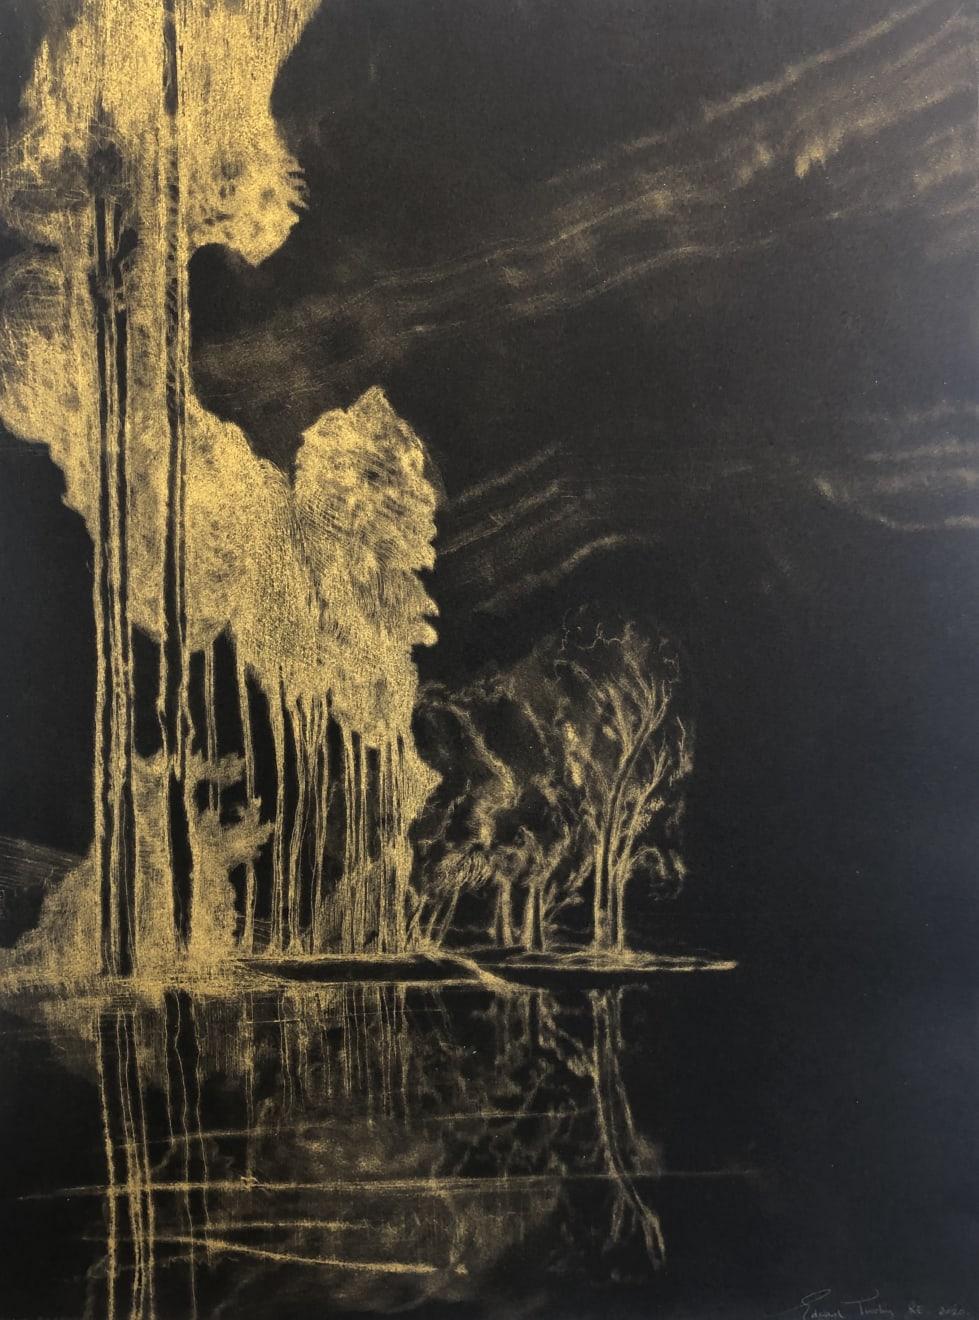 Summer Auction 2020, LOT 138 - Edward Twohig - 'Untitled' , 2020